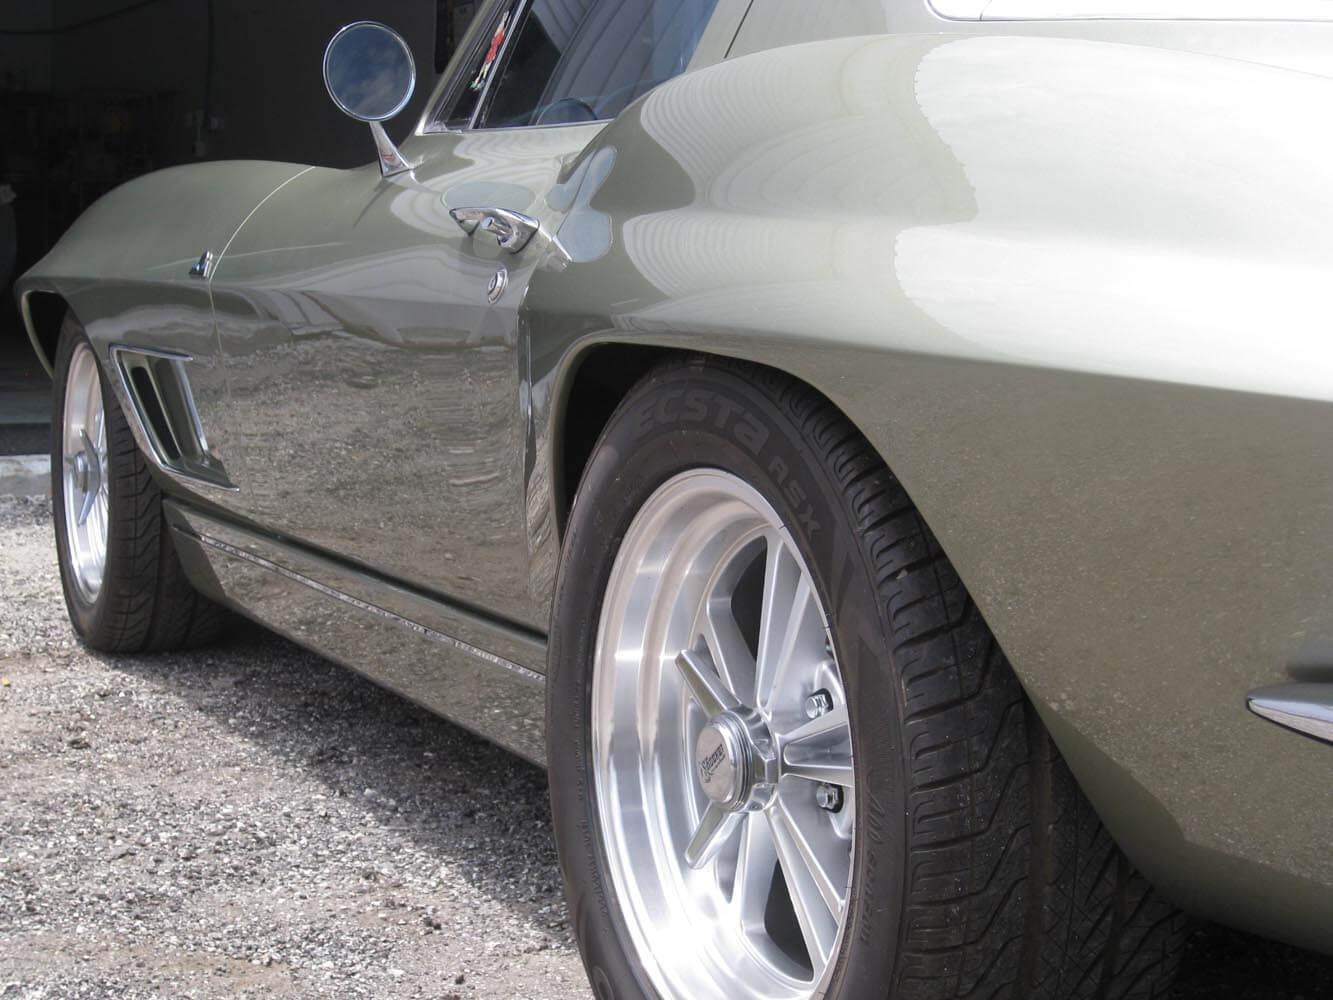 IMG_1133 Kidd Darrin's Restoration and Custom Built Cars Melbourne Florida